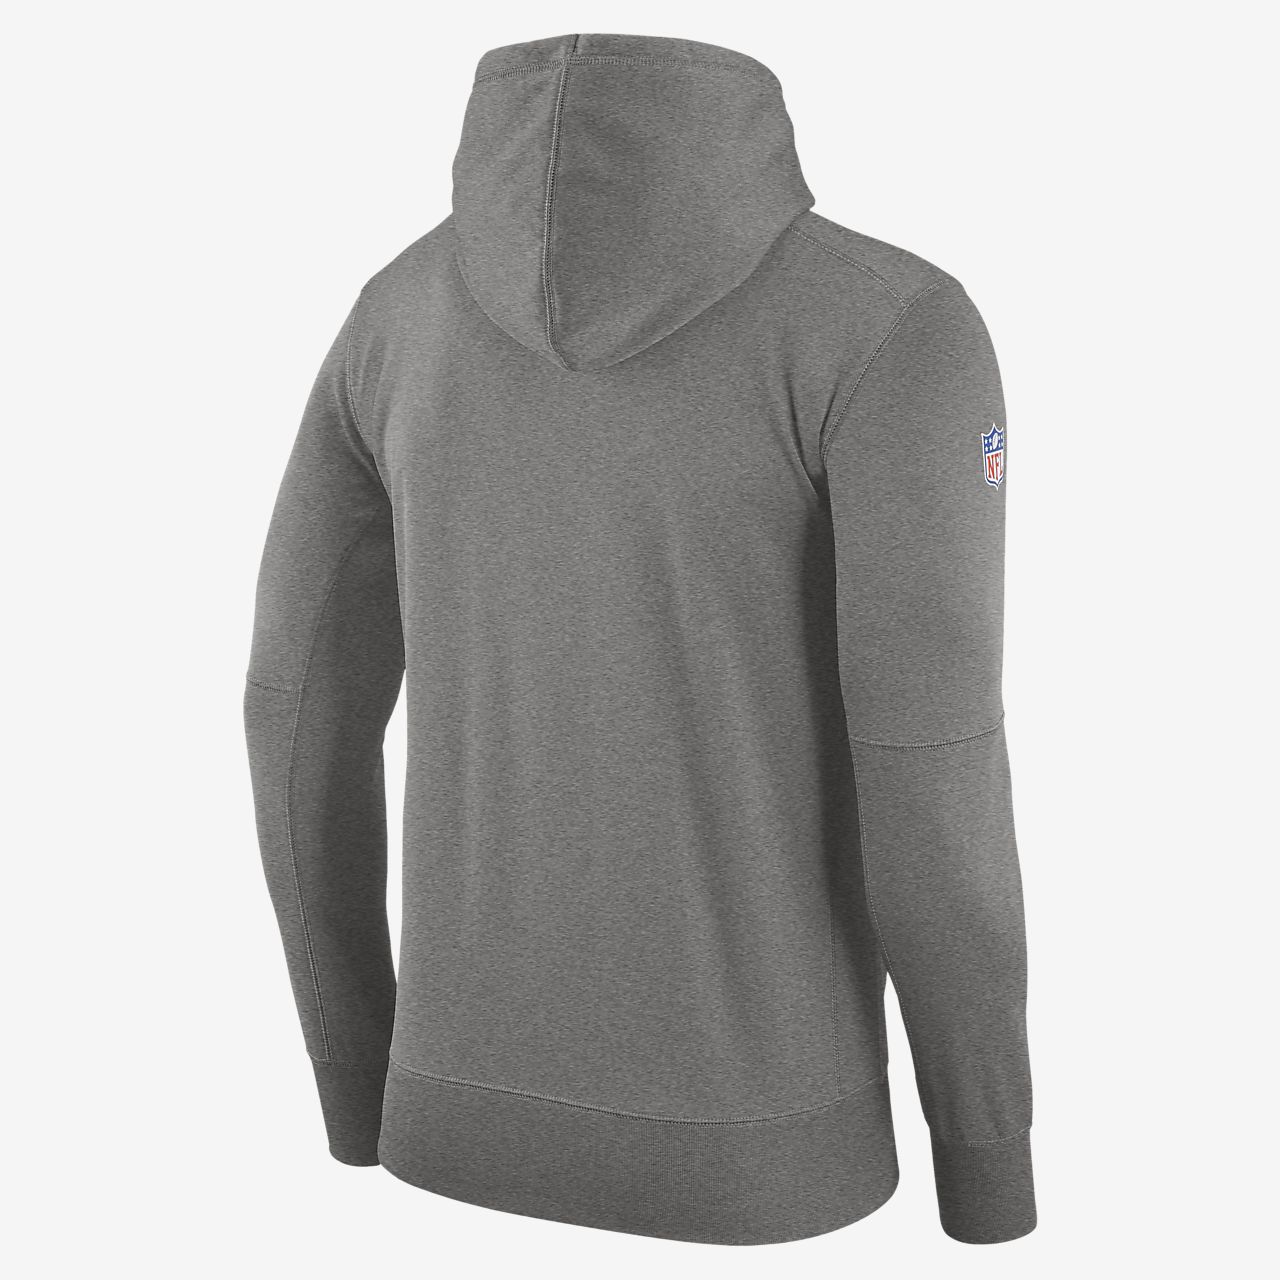 9e9d30a60d8d8 Nike Dri-FIT Therma (NFL Steelers) Men's Pullover Hoodie. Nike.com